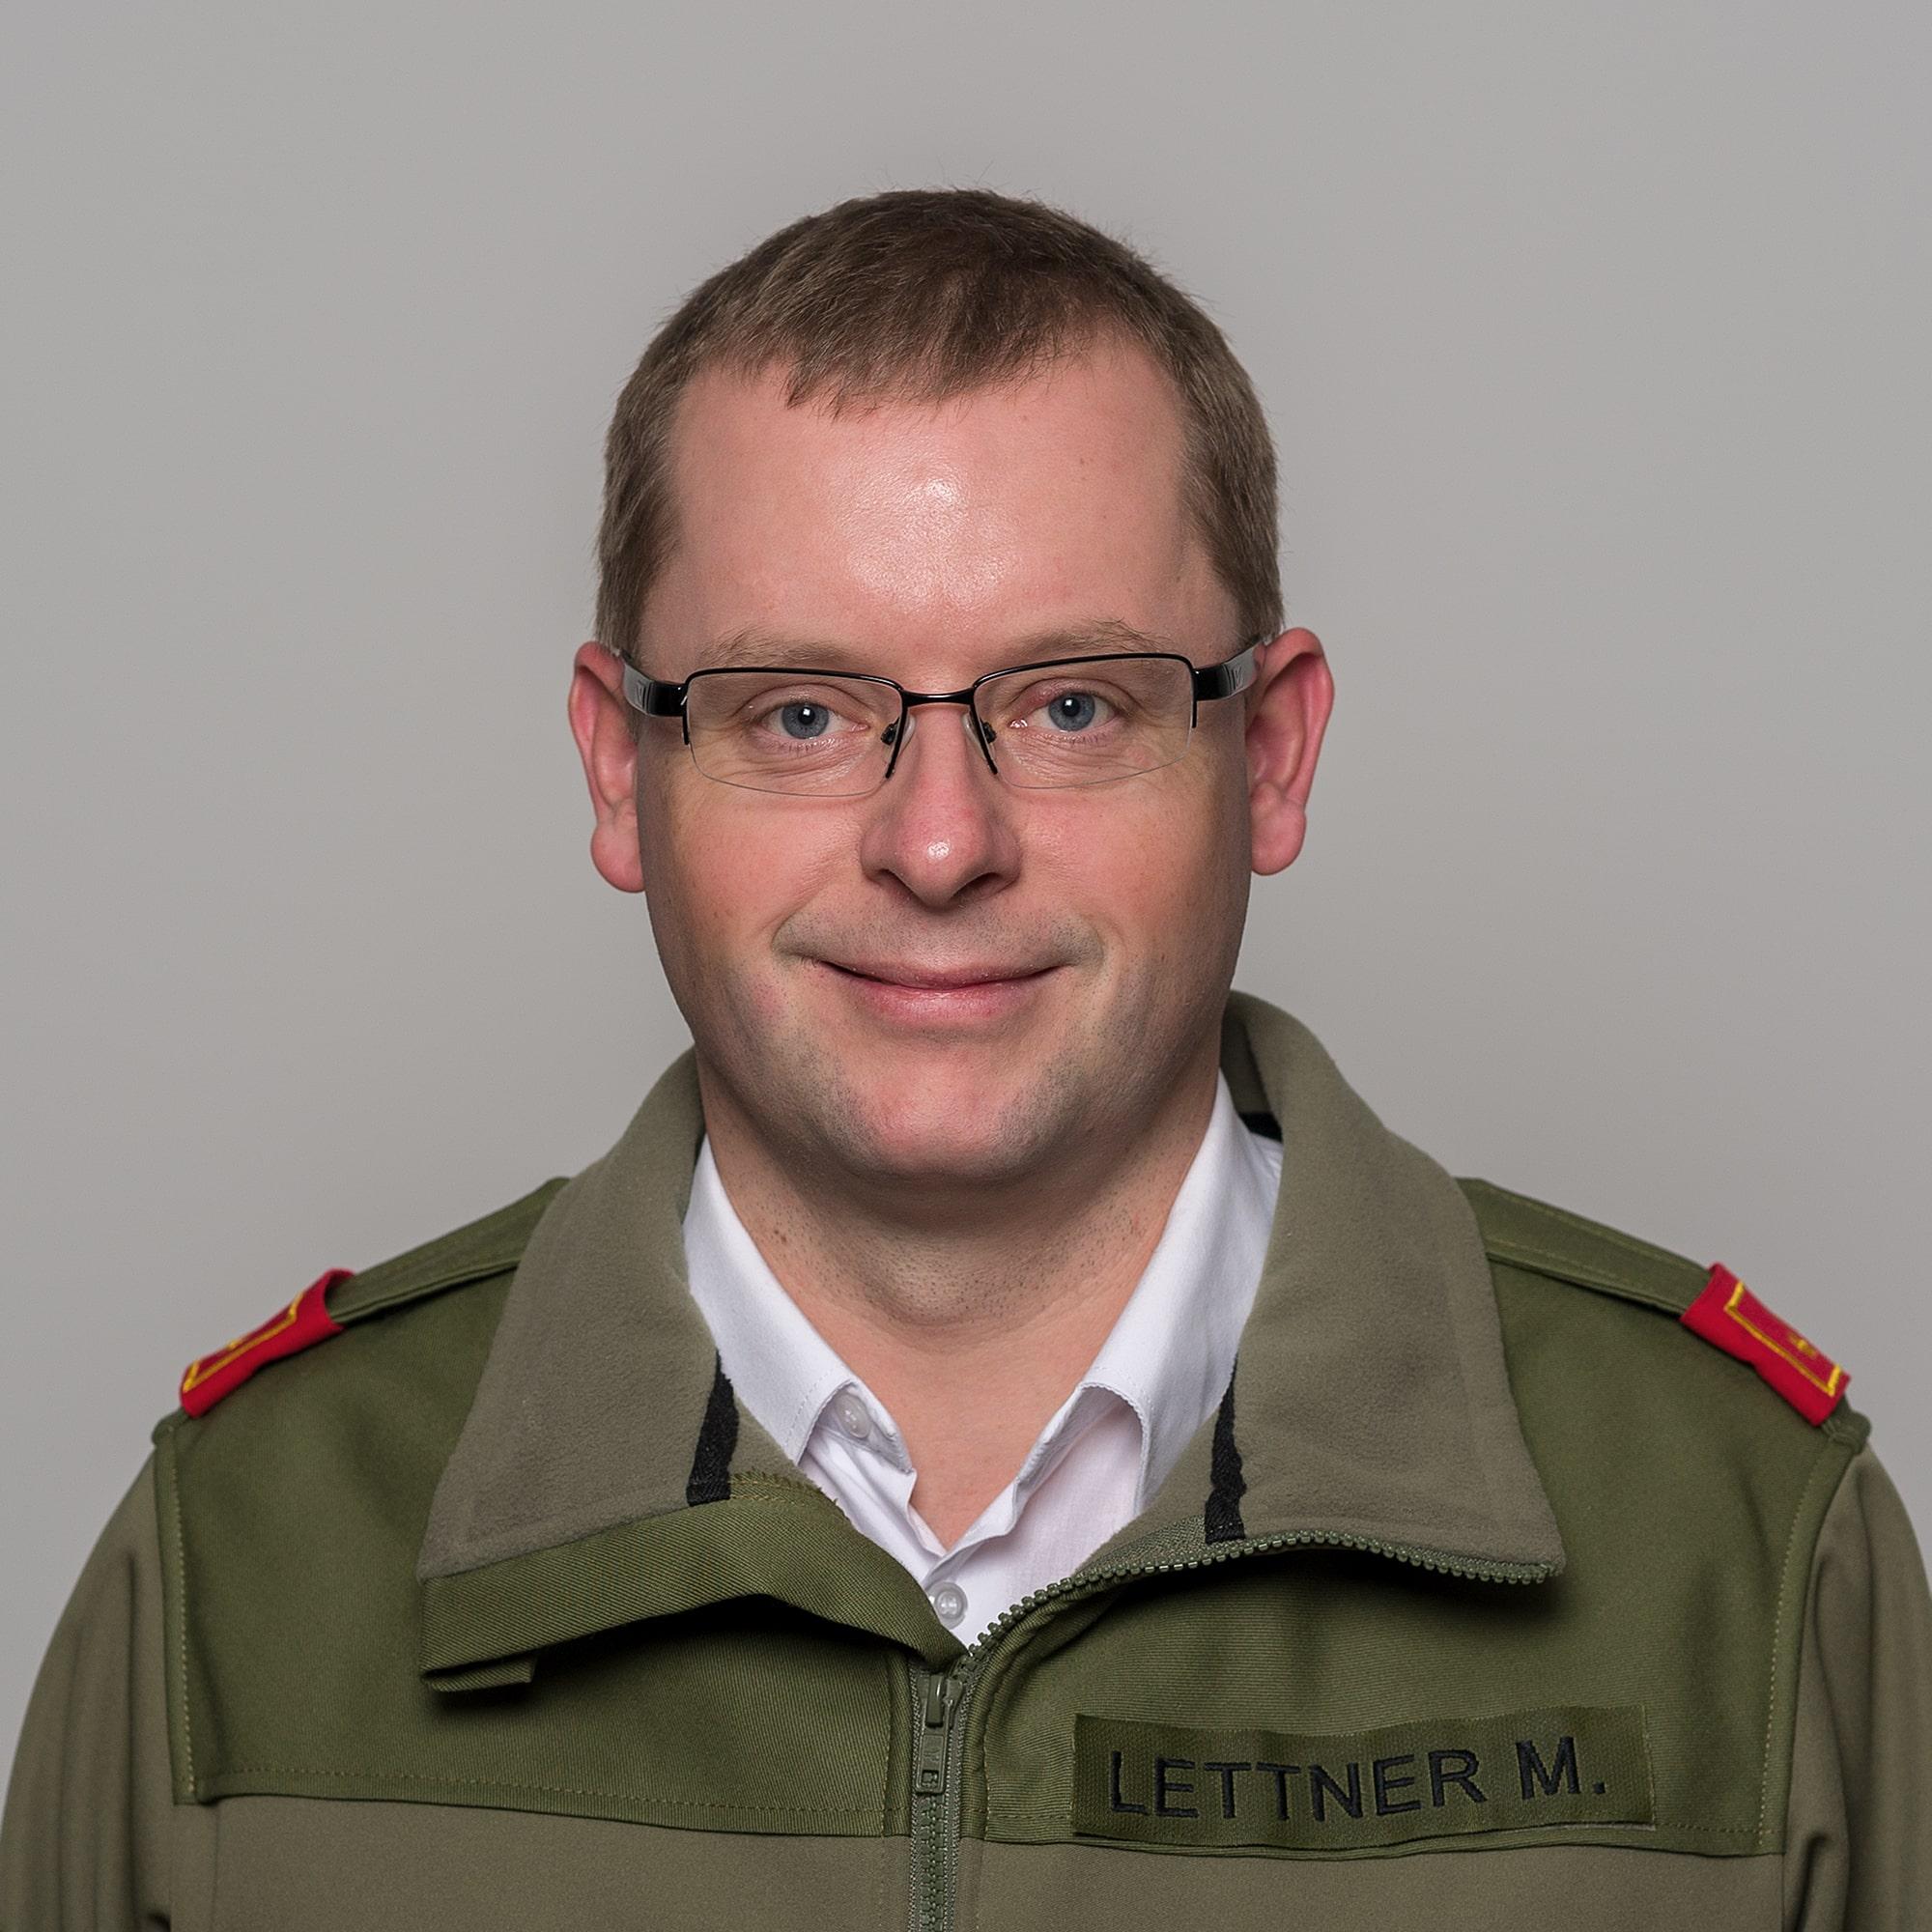 BI Martin Lettner